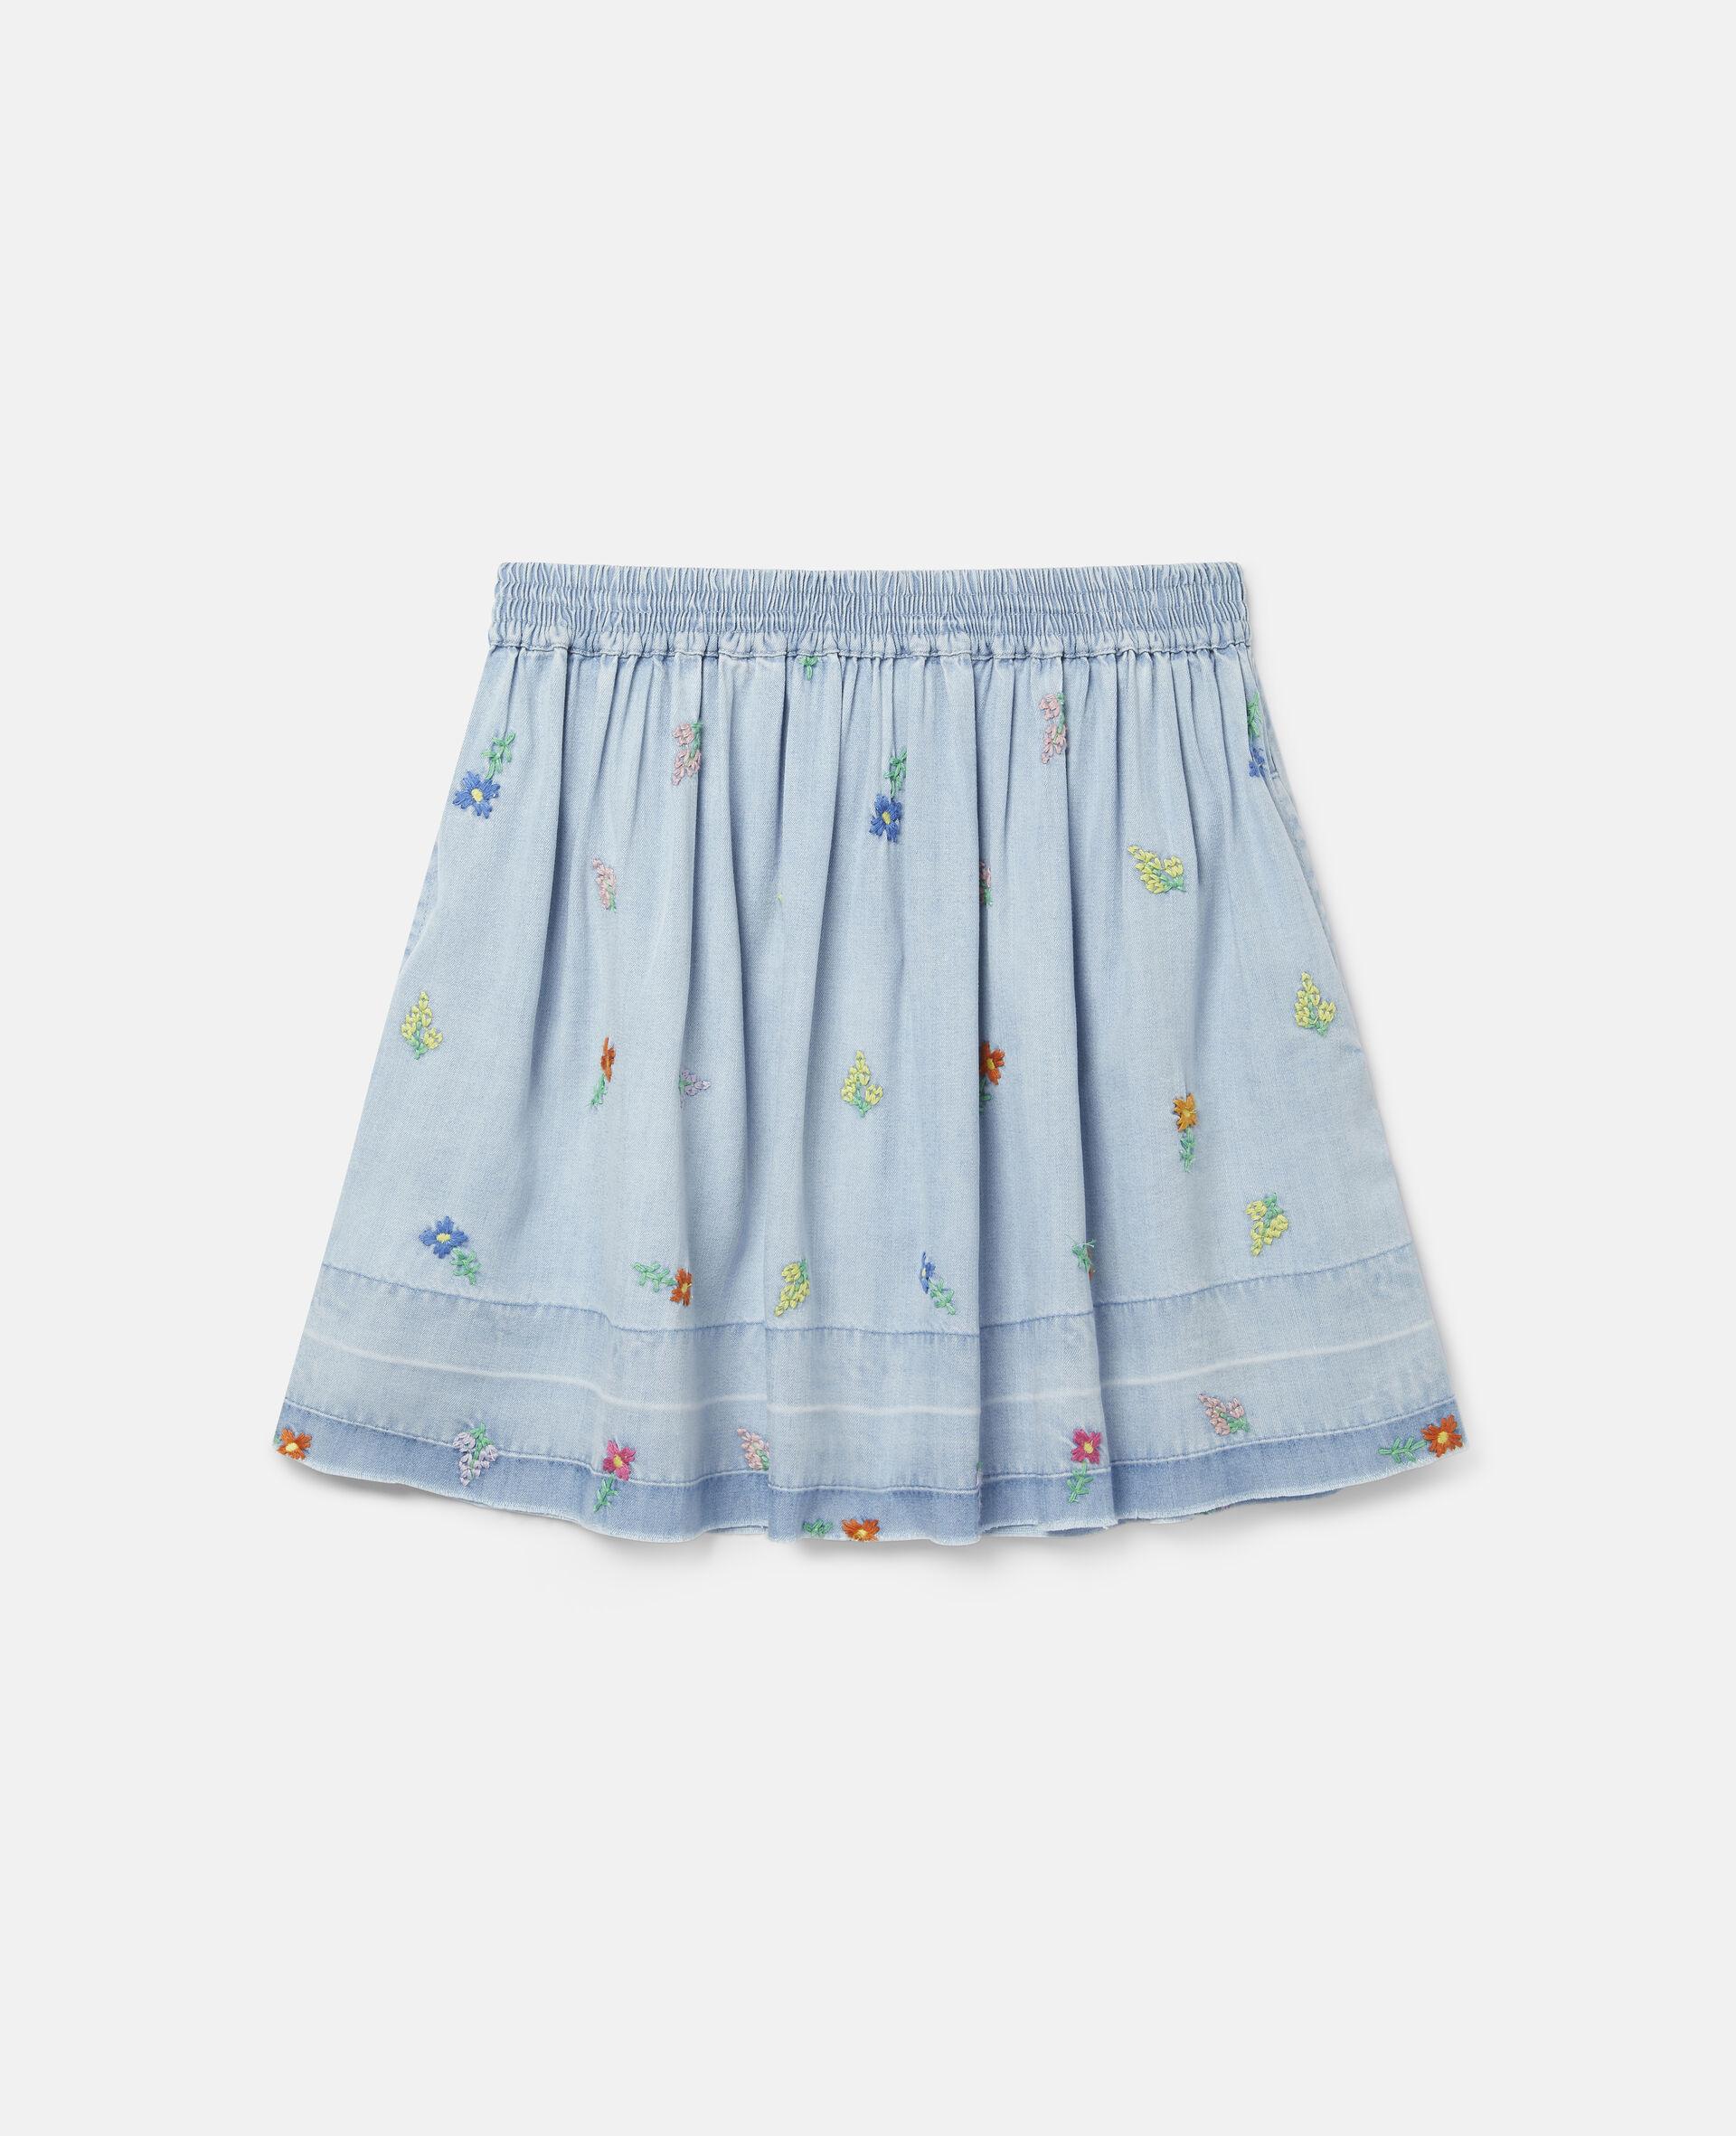 Embroidered Flowers Denim Skirt-Blue-large image number 0